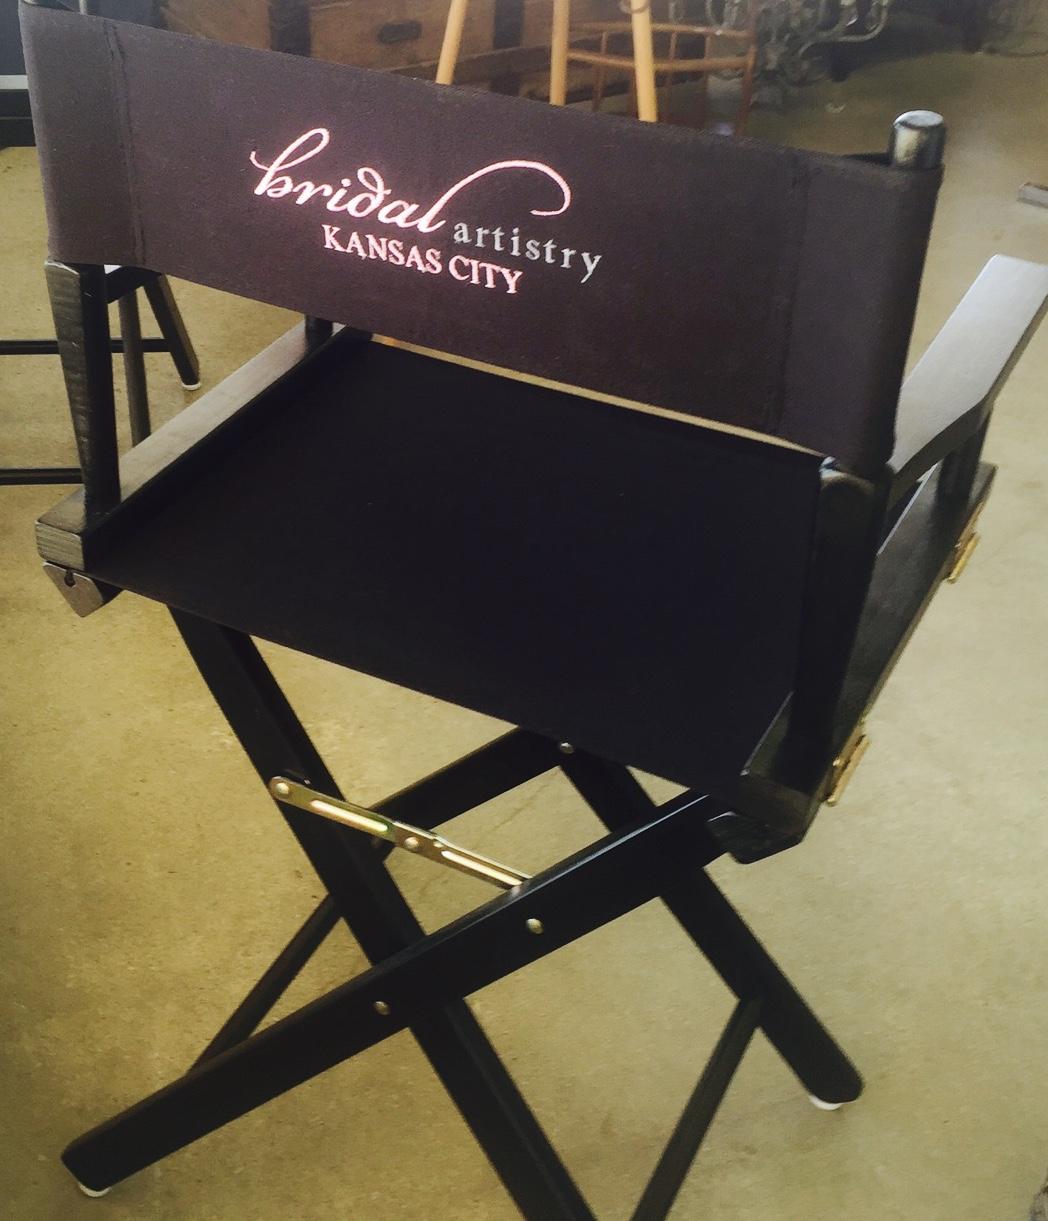 Bridal Artistry Kansas City Makeup Chair